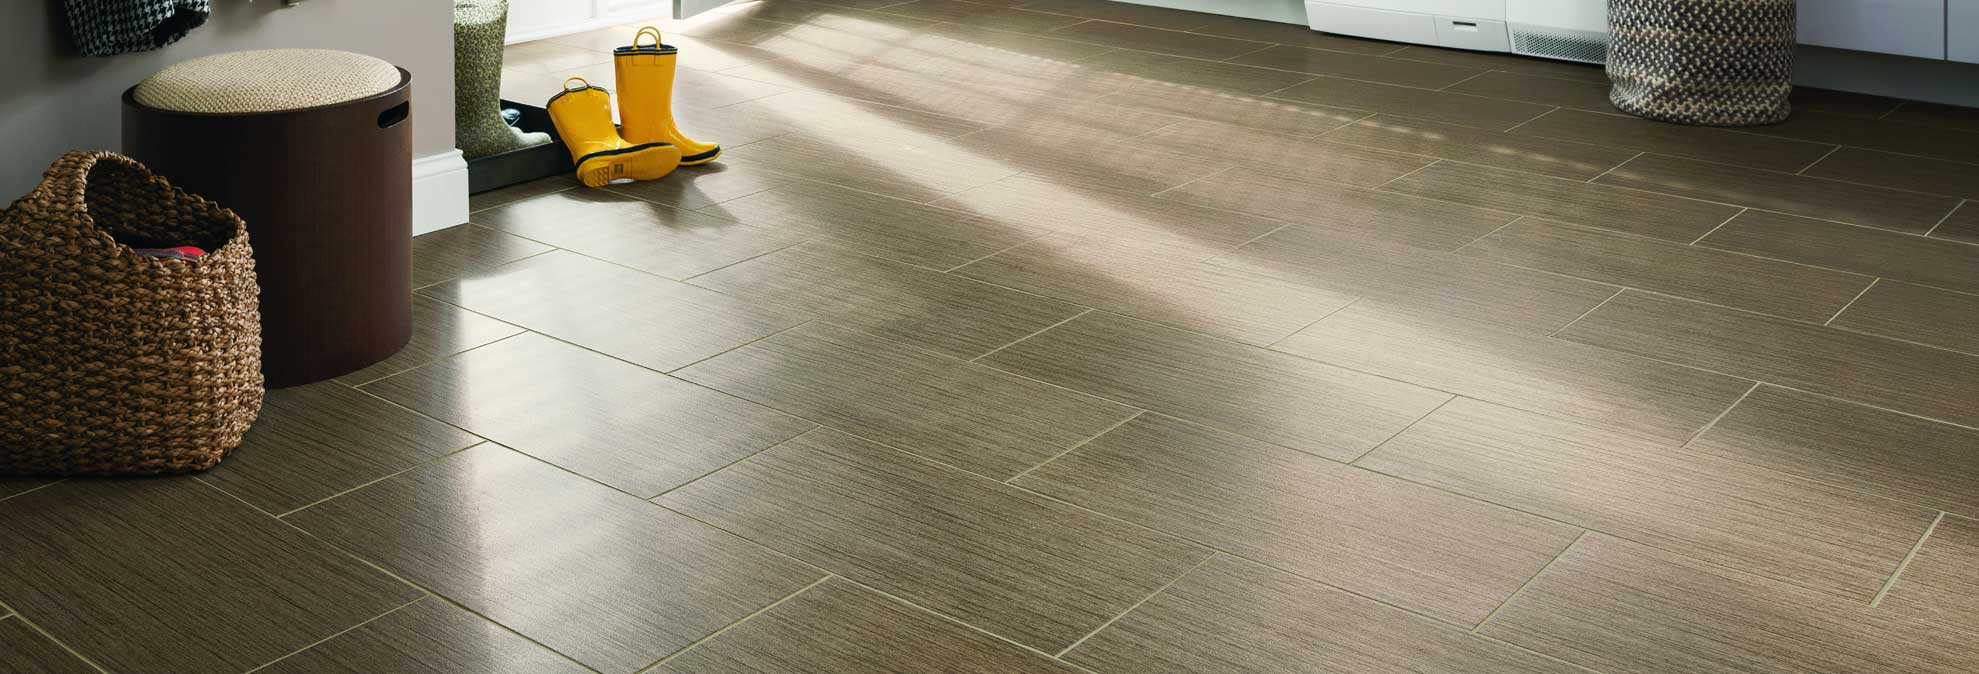 best laminate flooring best flooring buying guide - consumer reports DDRRNXQ